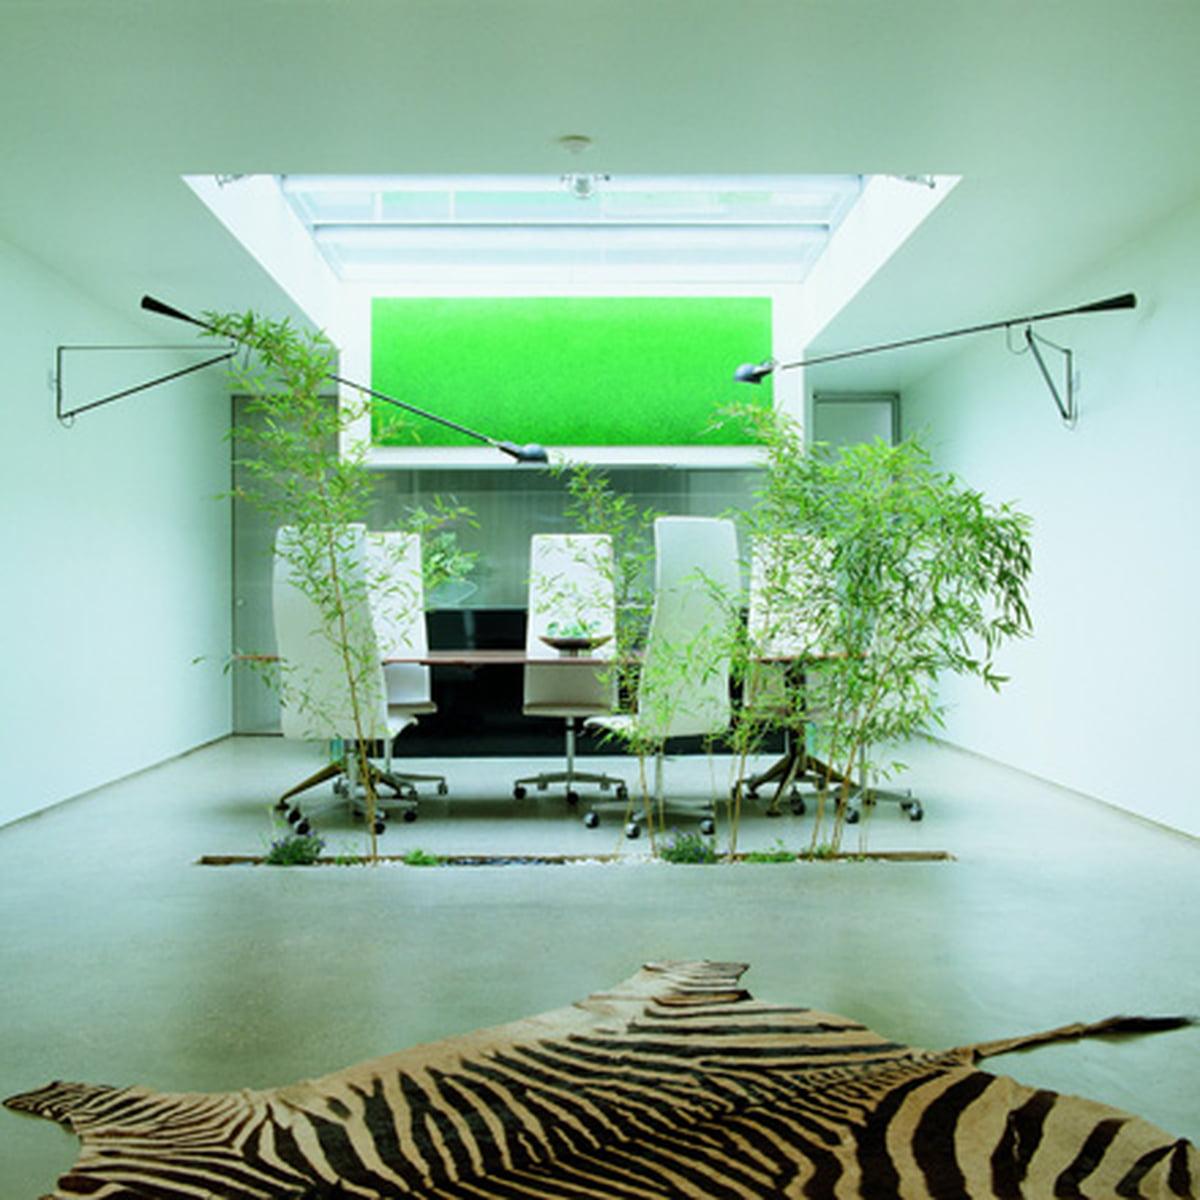 flos 265 wandleuchte von paolo rizzatto. Black Bedroom Furniture Sets. Home Design Ideas